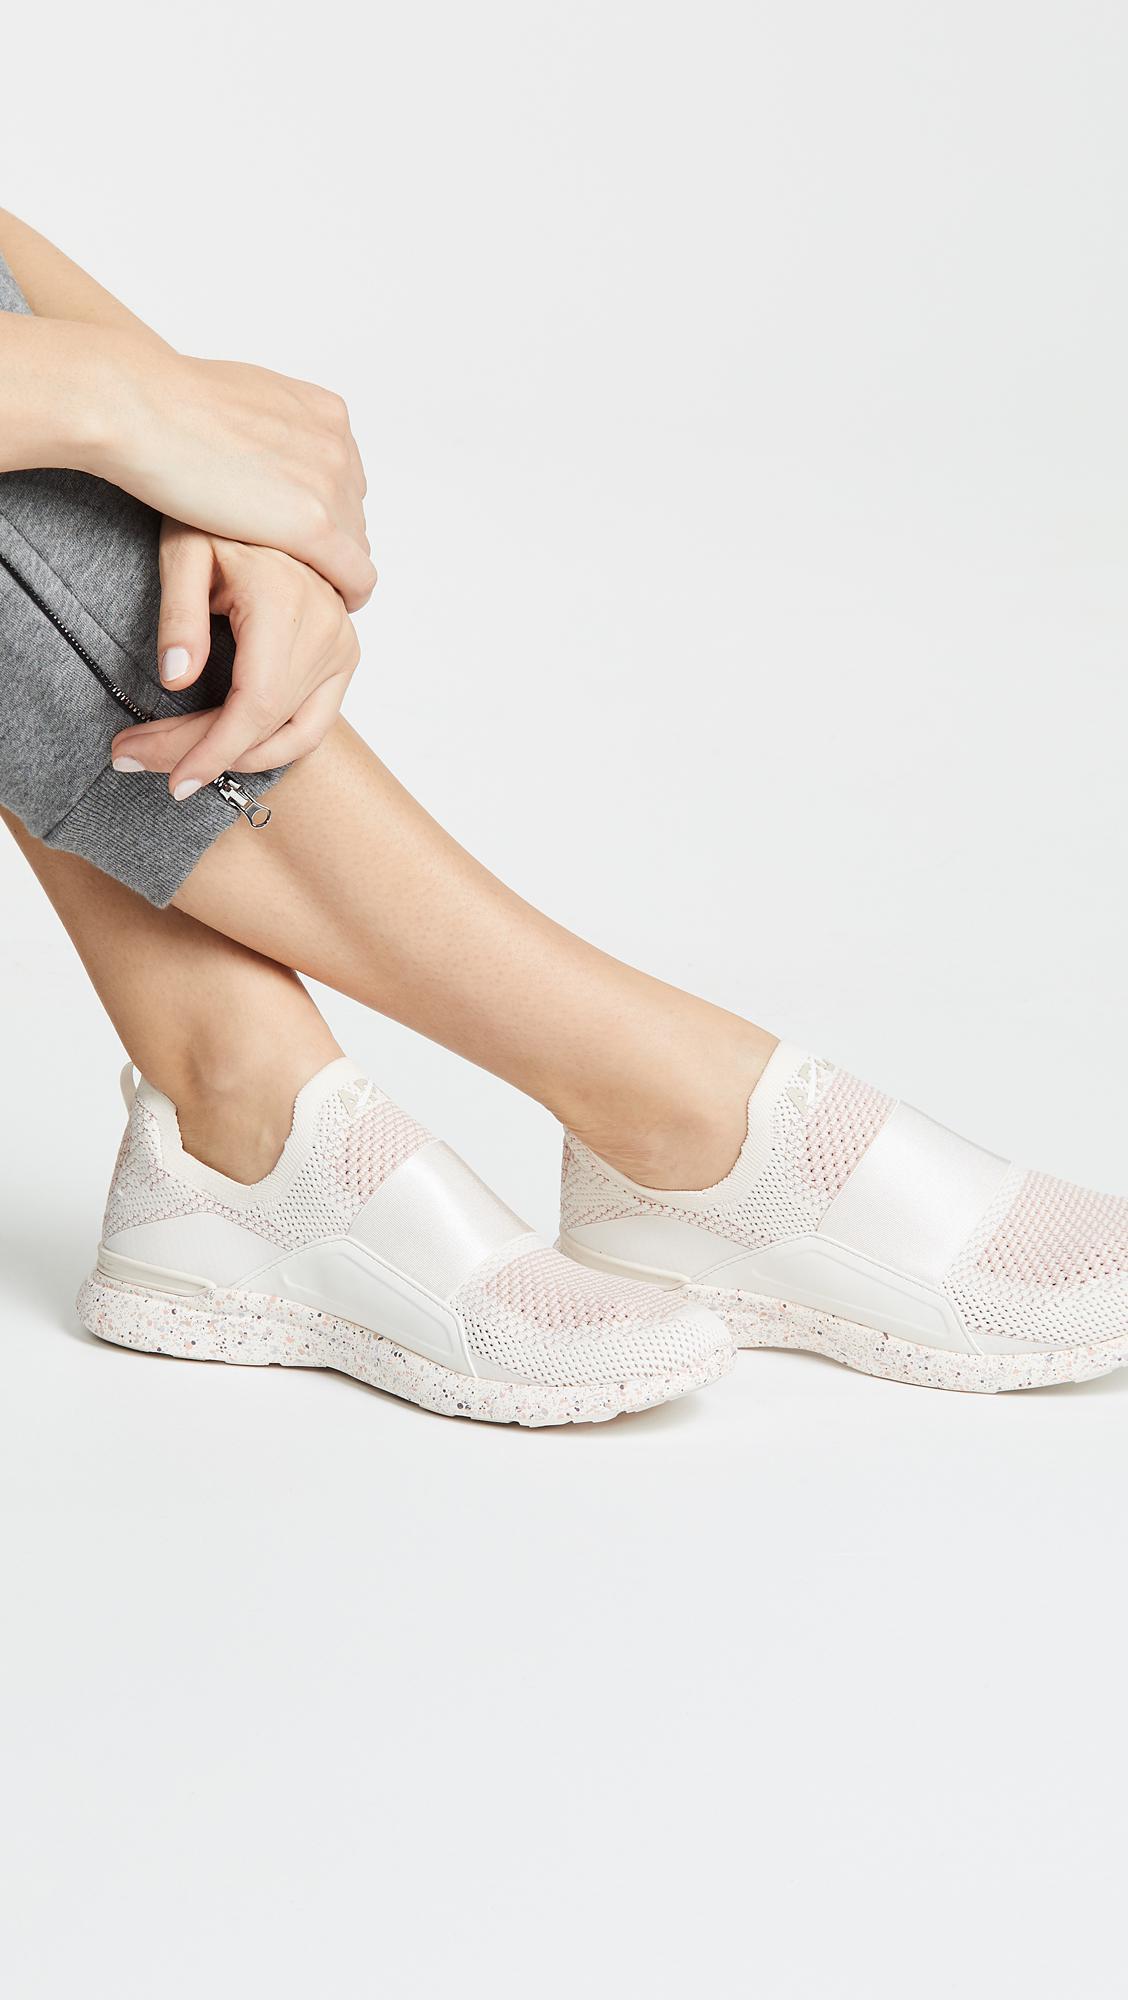 APL Shoes Techloom Bliss Sneakers in